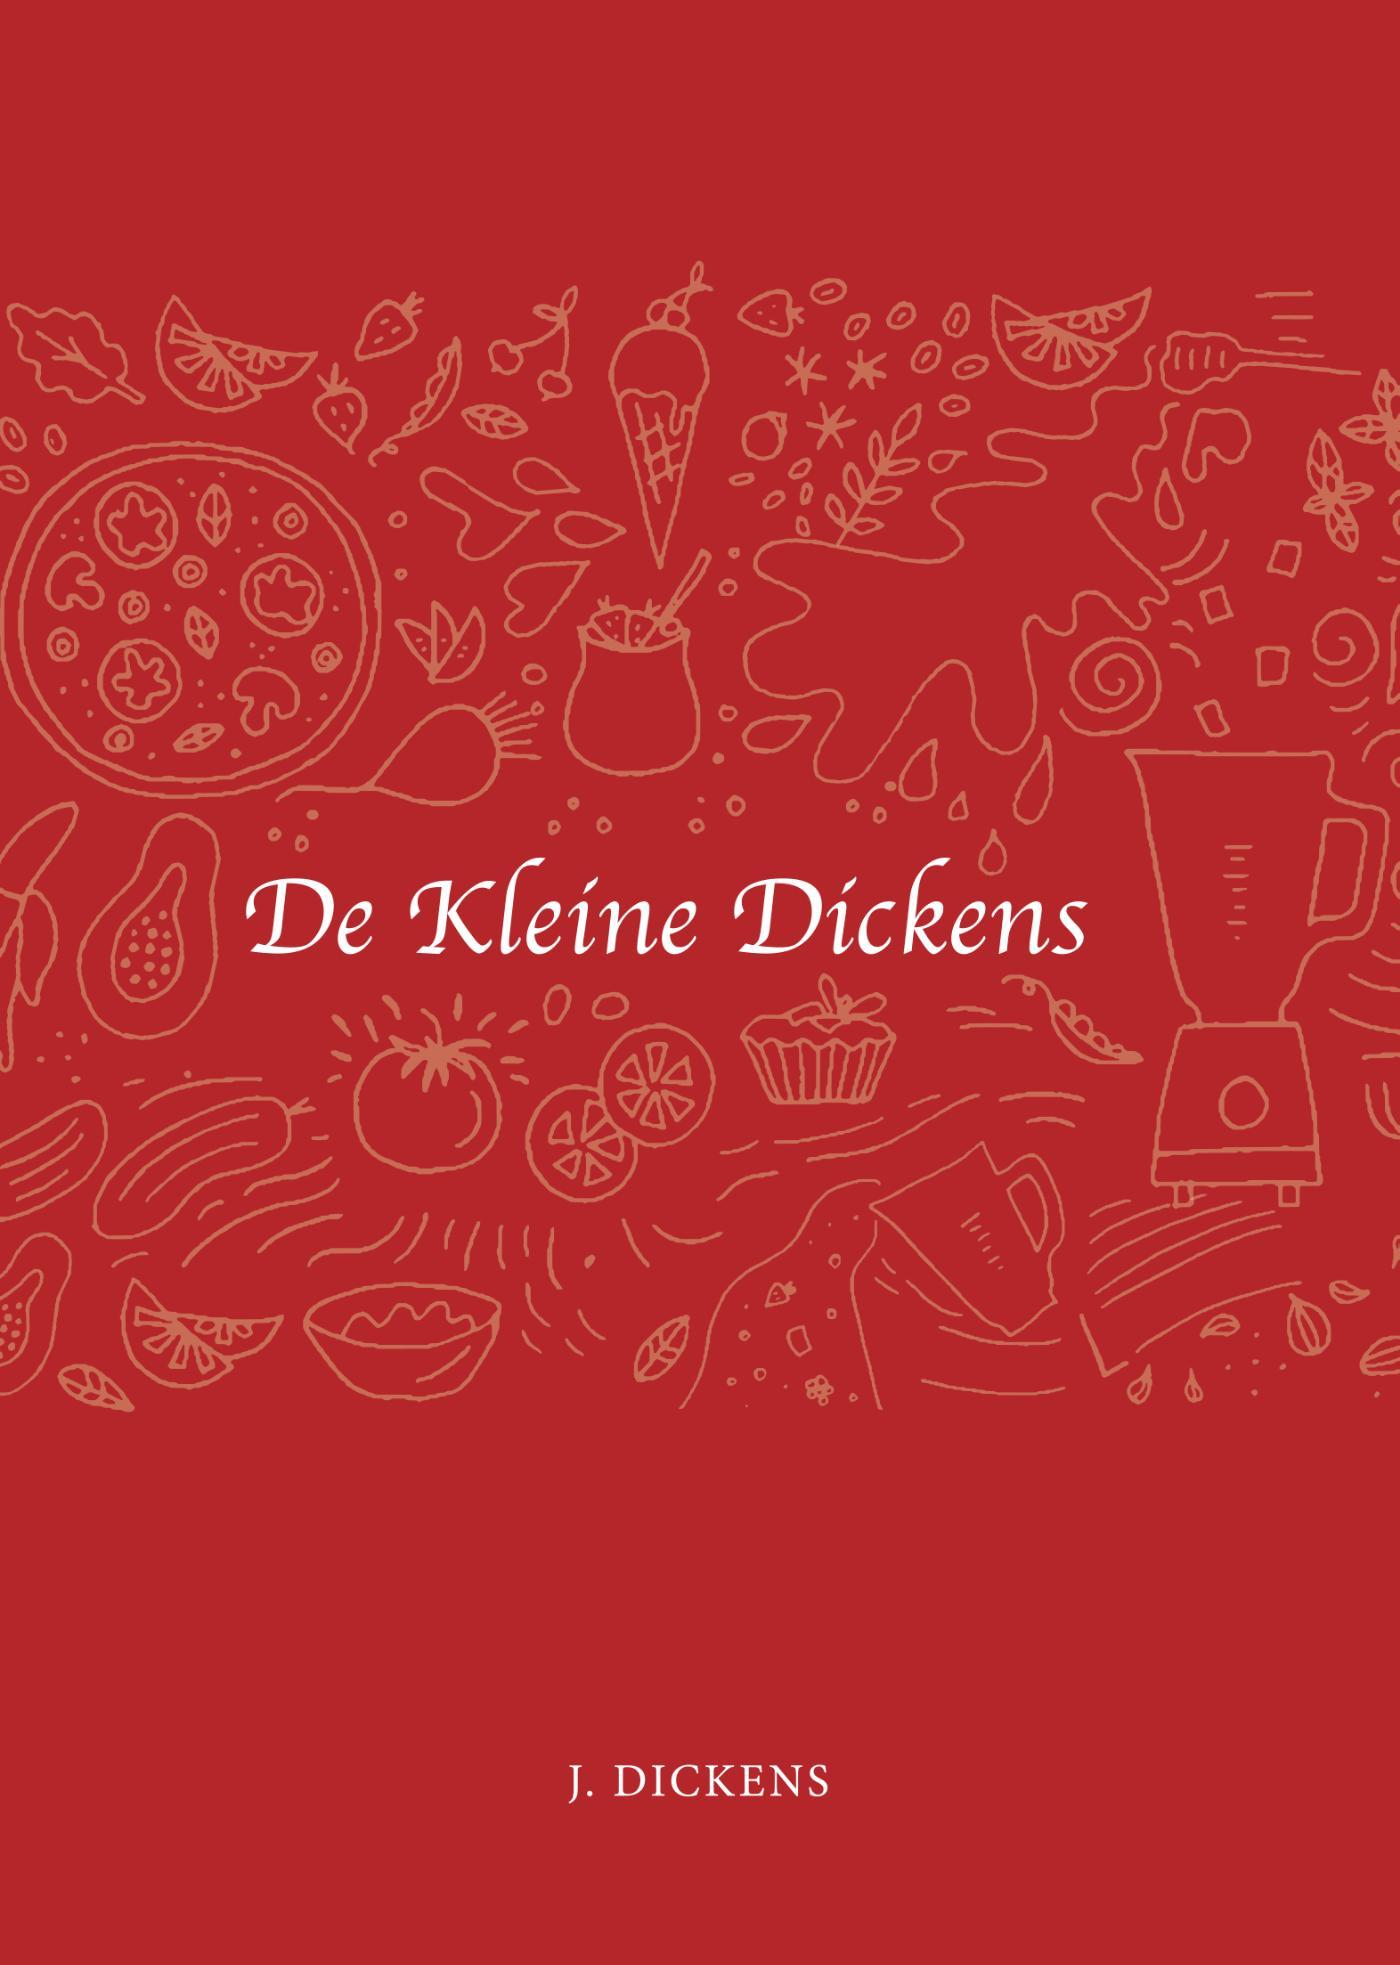 Cover de kleine Dickens